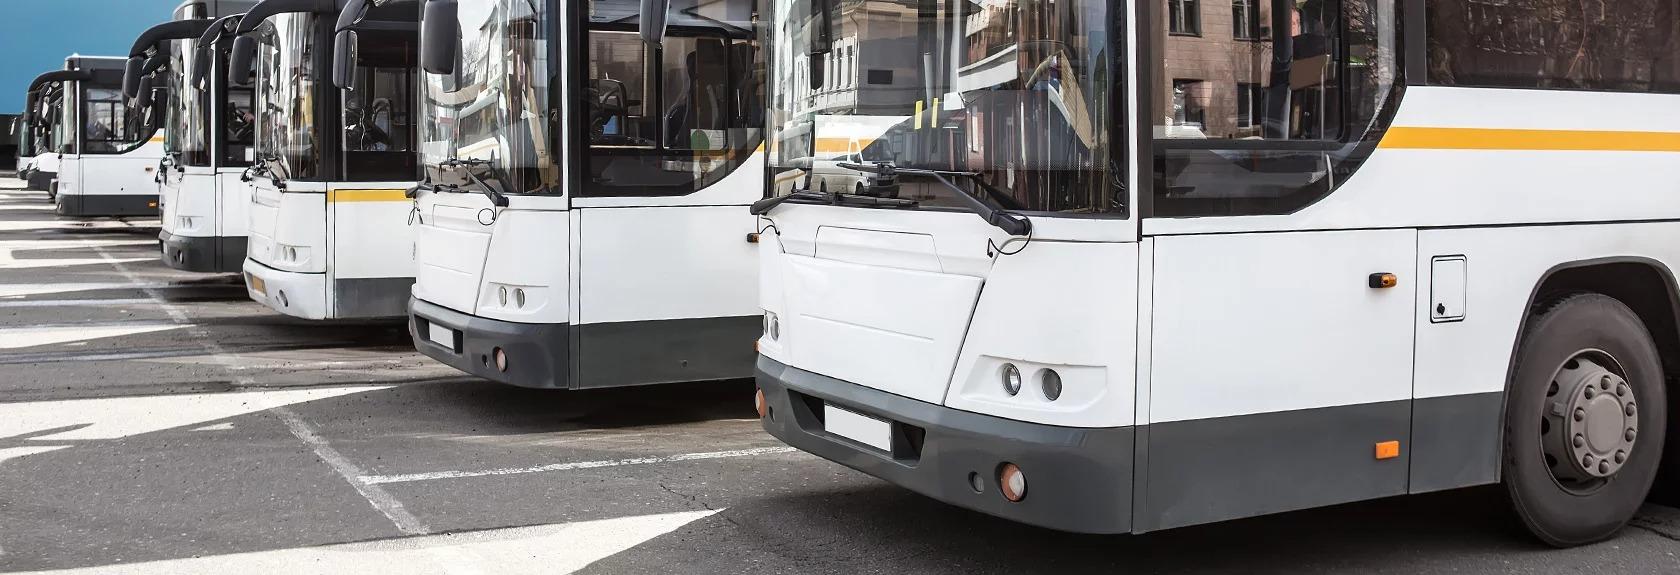 Bustransfer Ciampino Airport naar centrum Rome